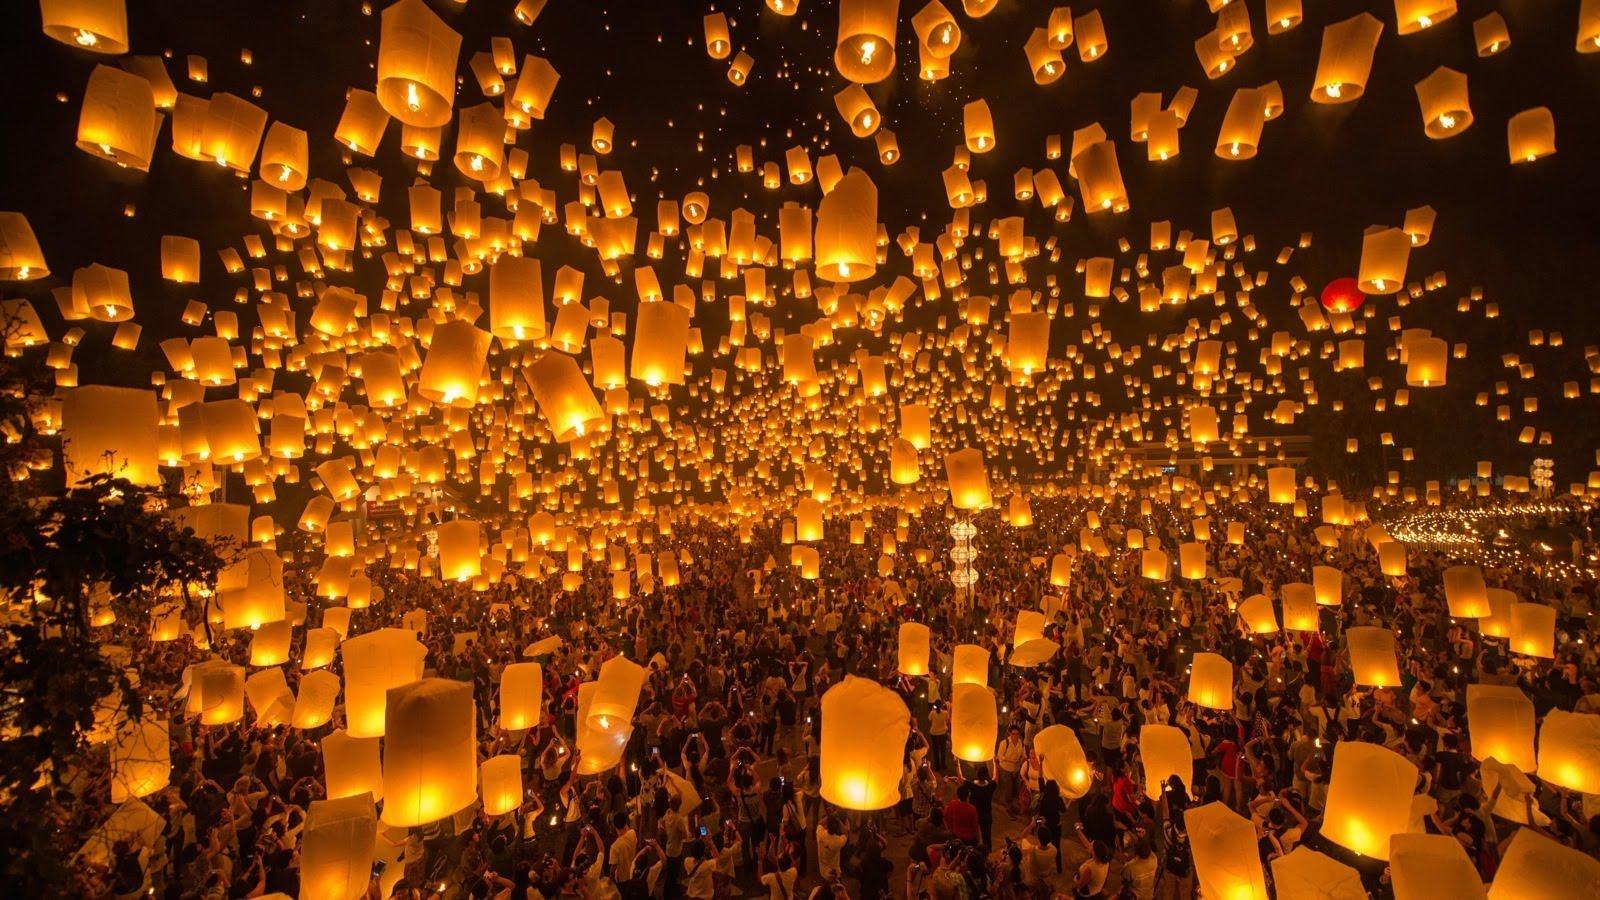 sky-lantern-festival-taiwan-secret-world